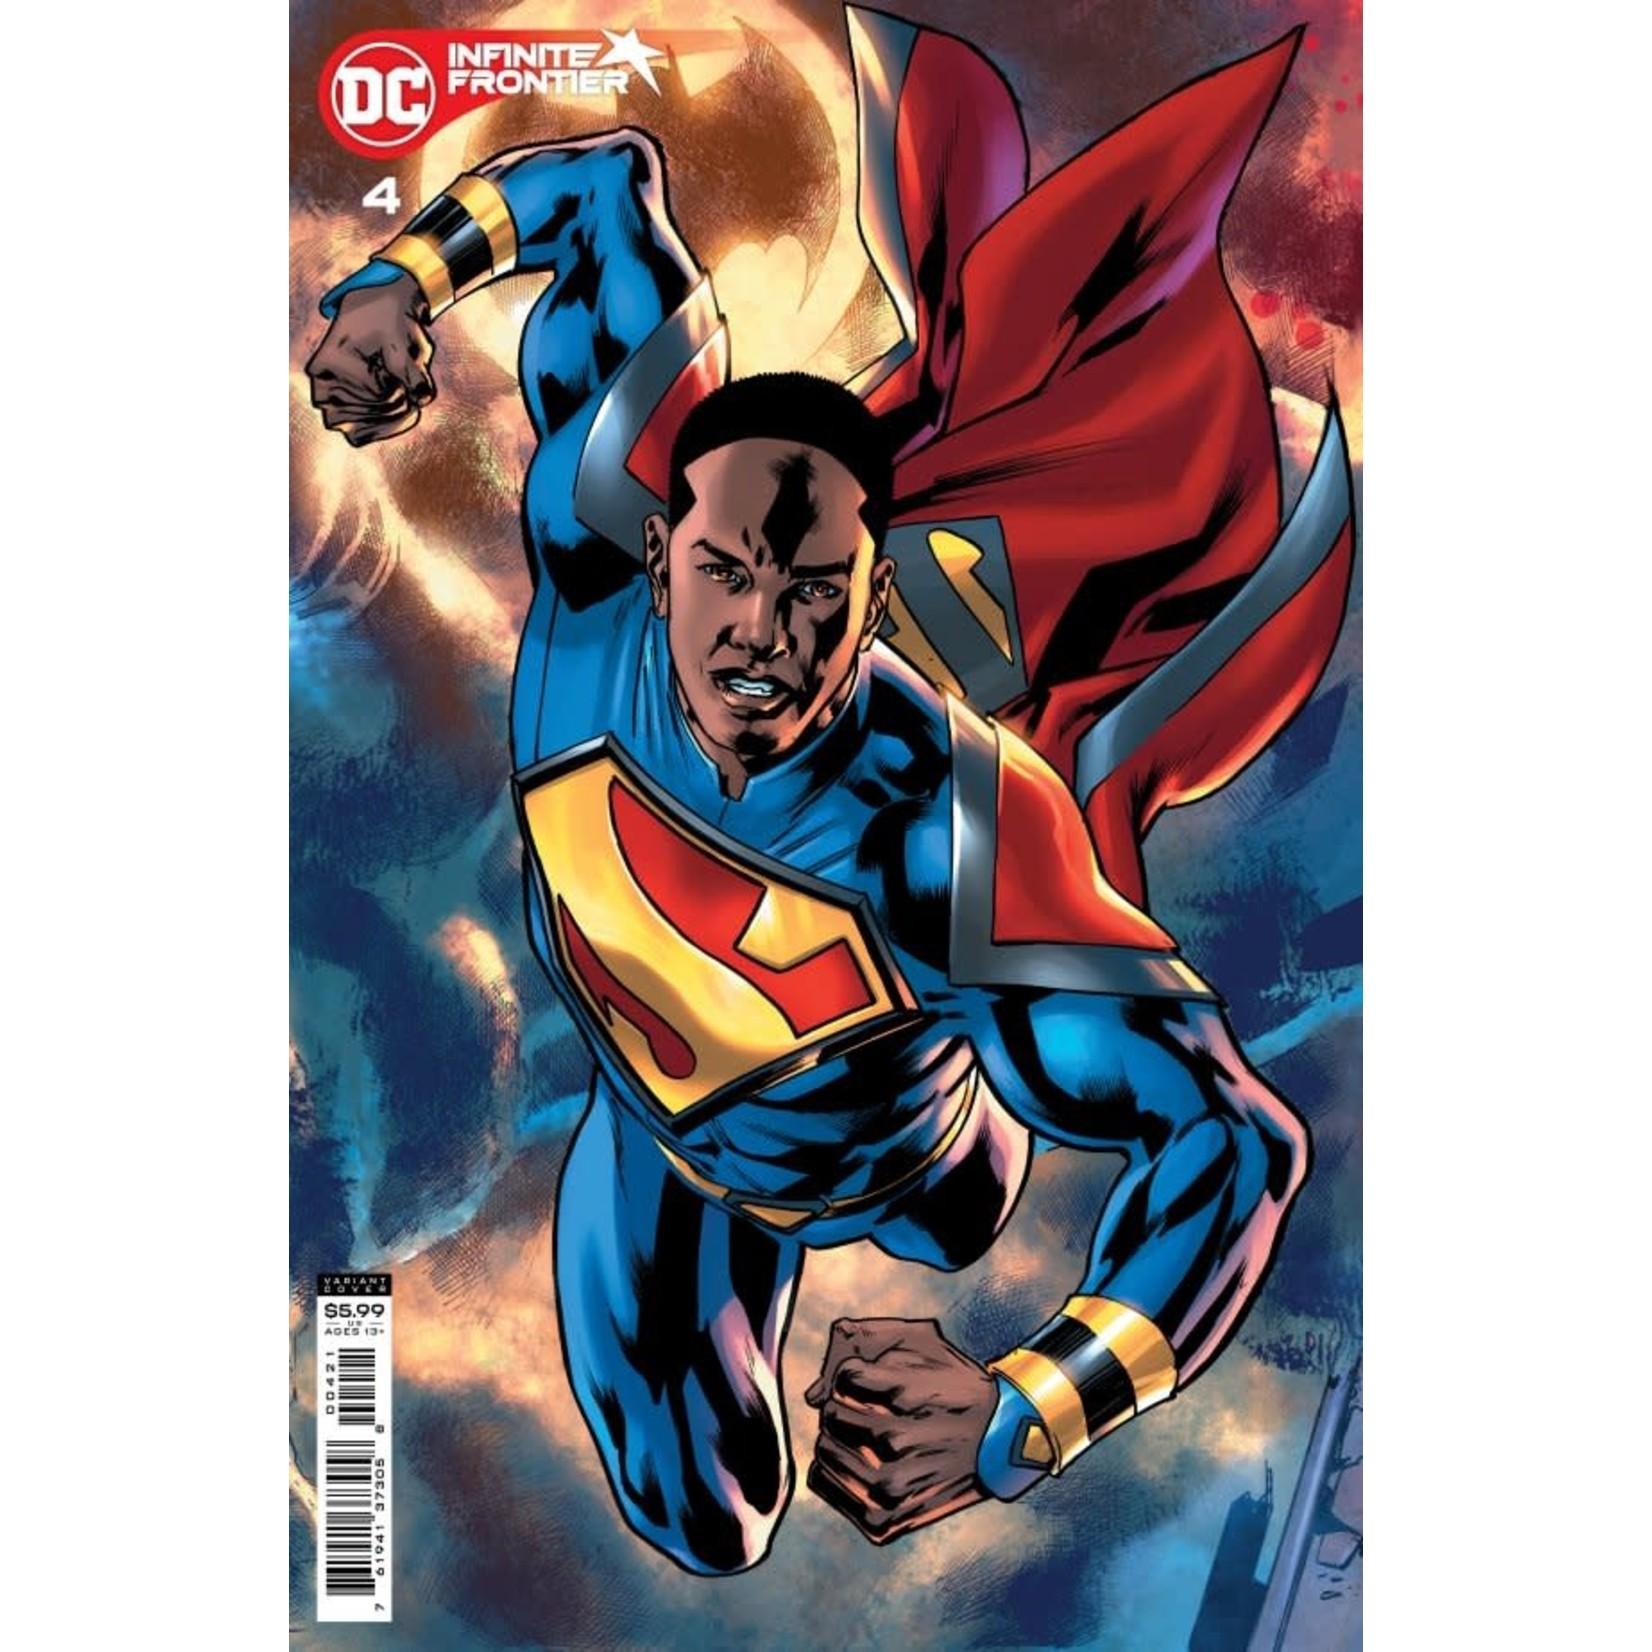 DC Comics Infinite Frontier #4 Cover B